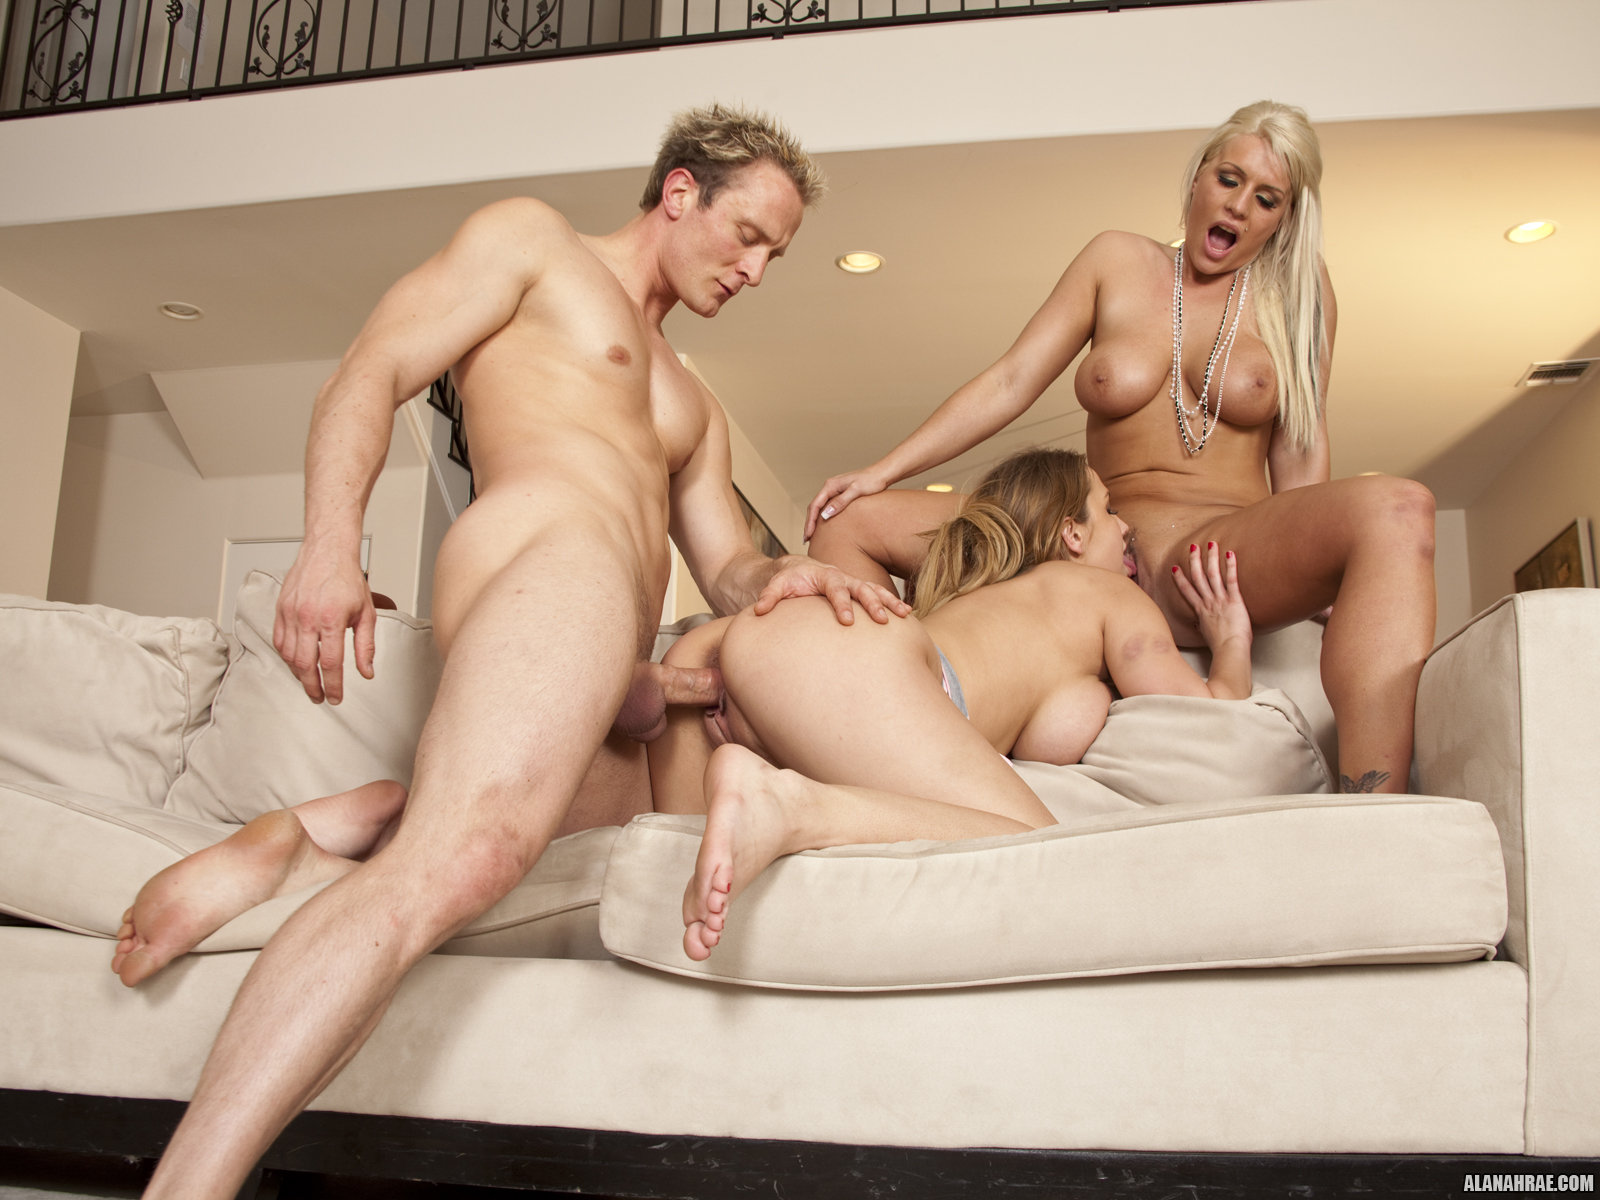 erotic private massage adult massage kent